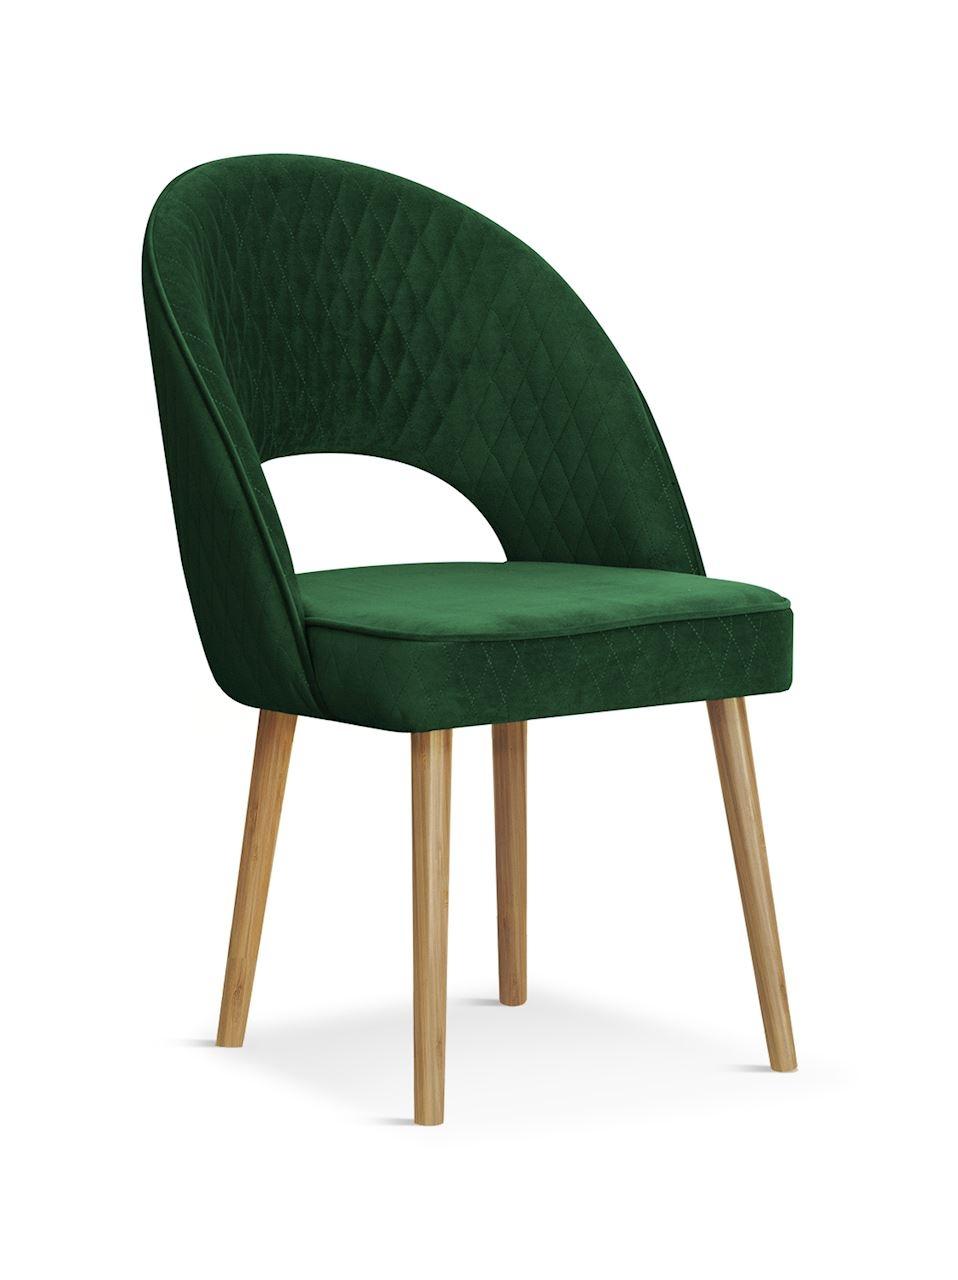 Scaun tapitat cu stofa si picioare din lemn Ponte Velvet Verde / Stejar, l56xA63xH89 cm imagine